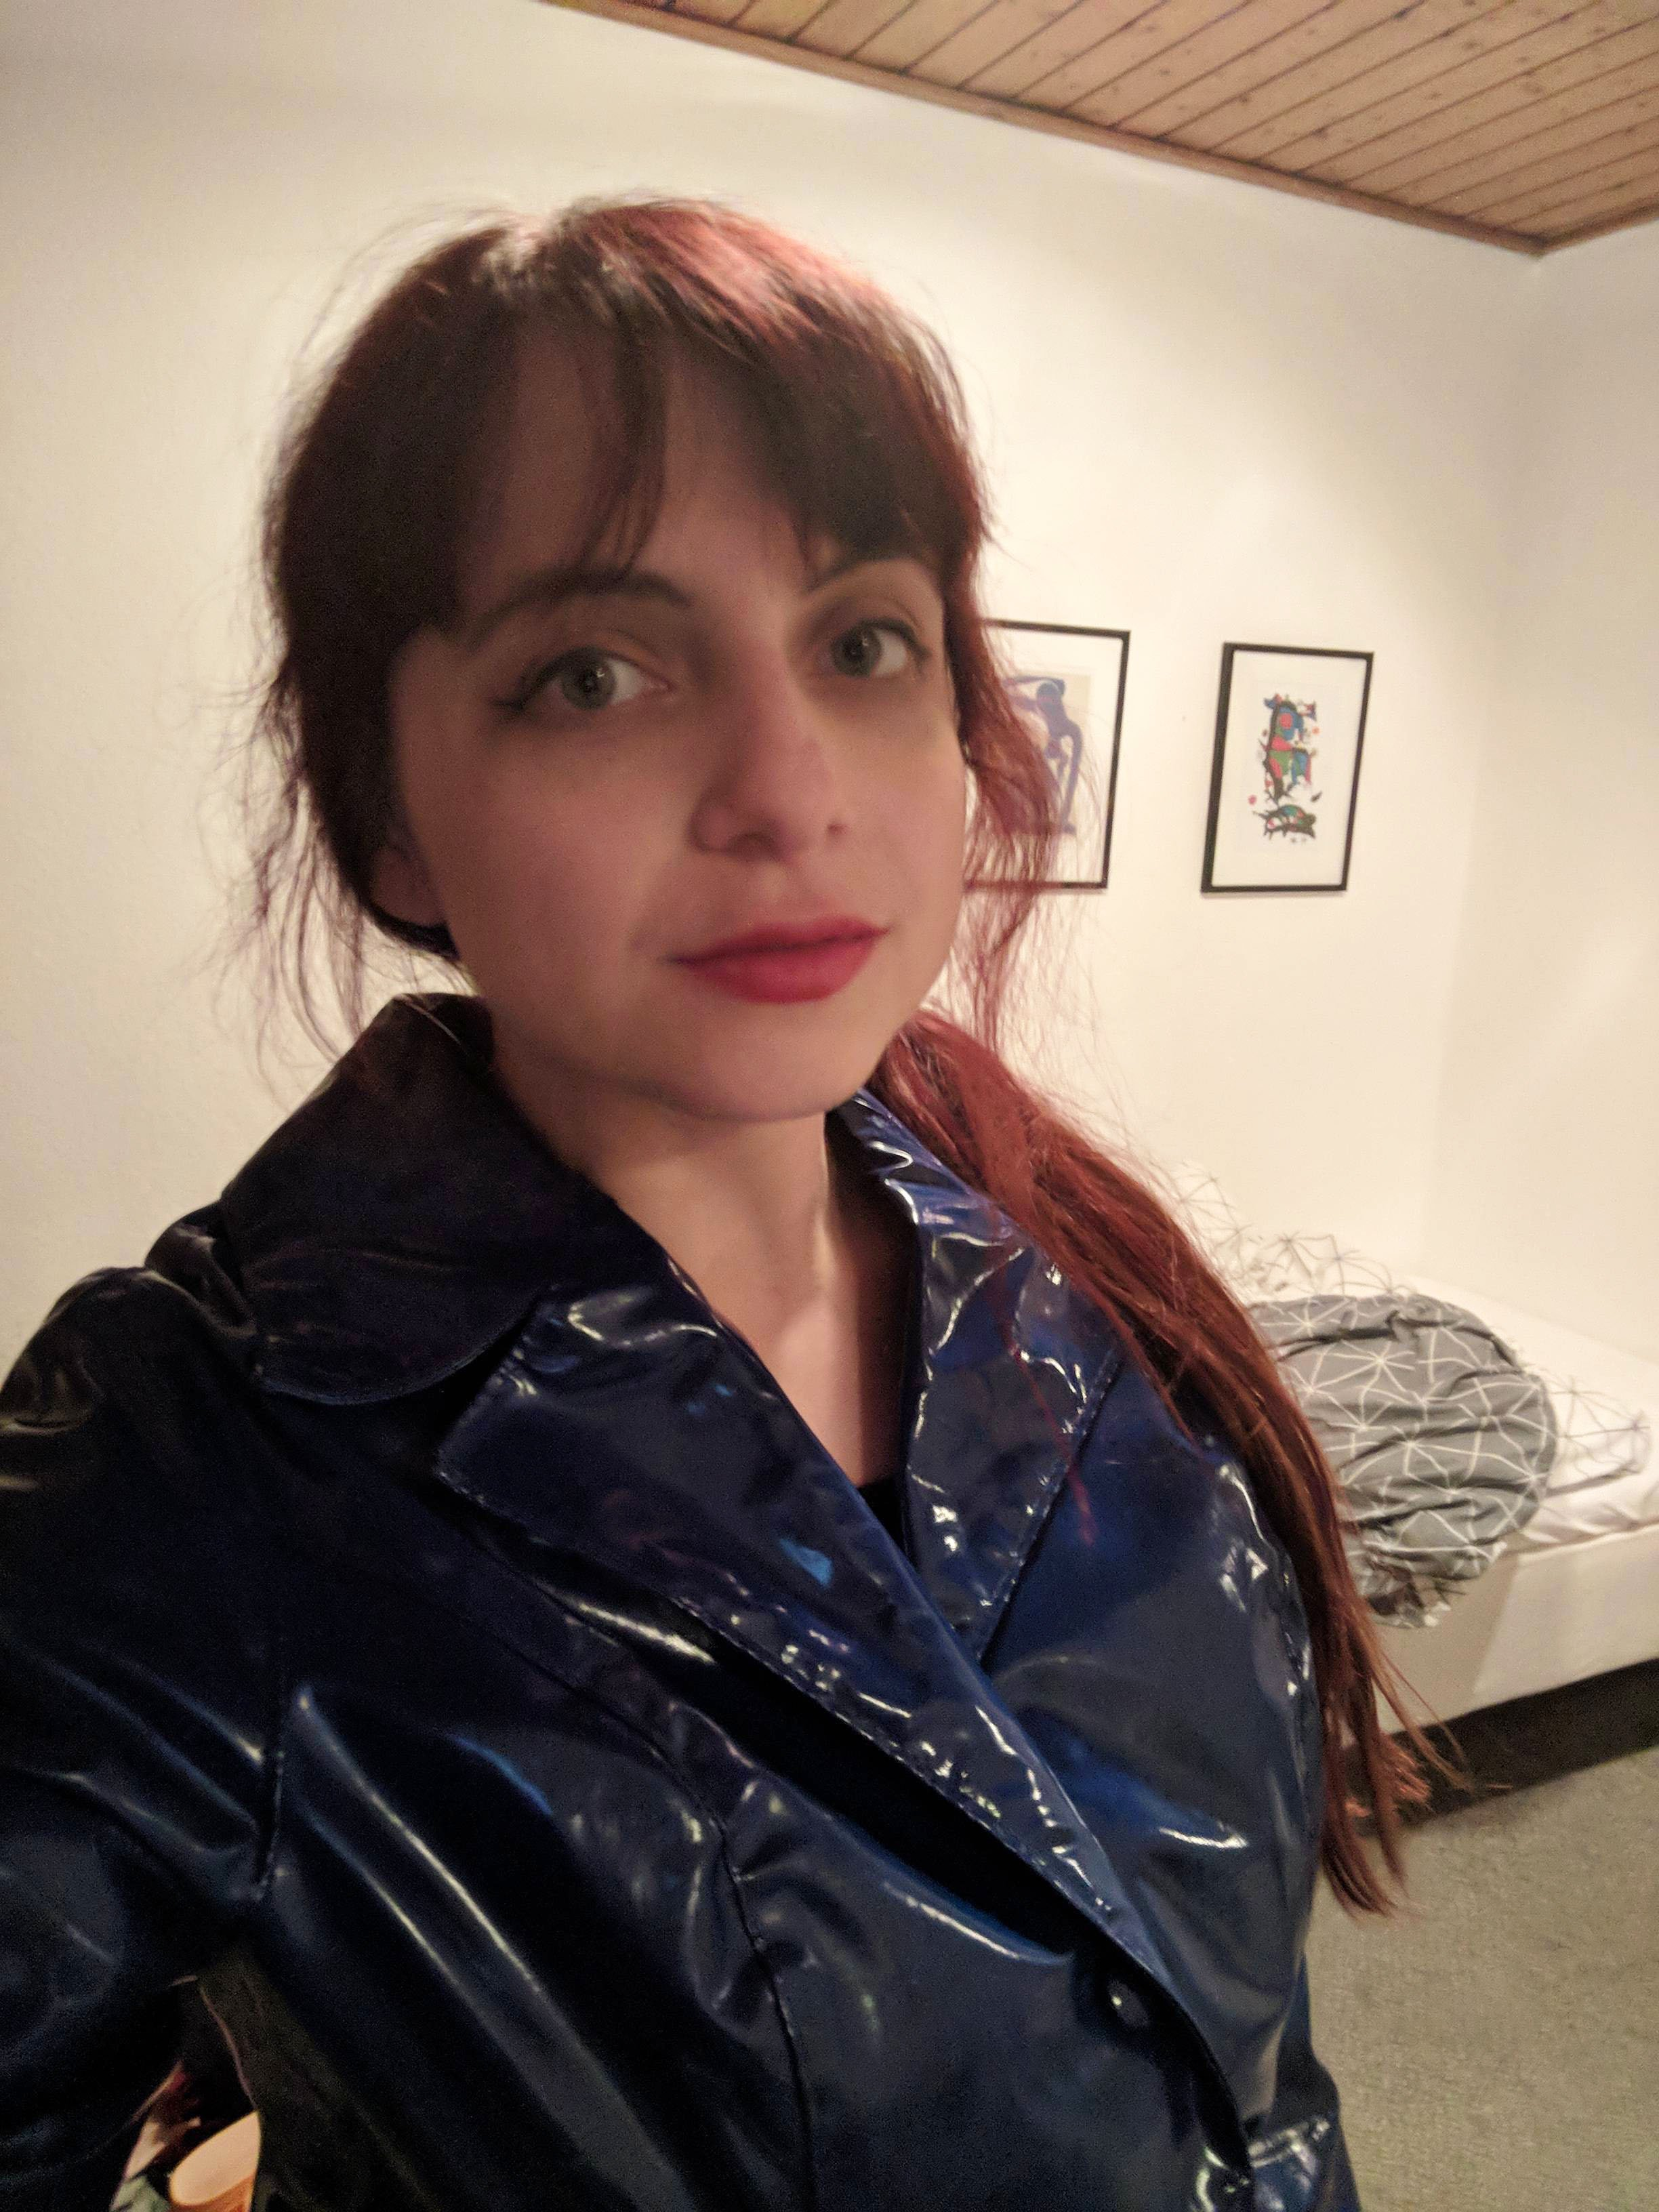 Fetisch regenmantel Regenmantel Fetisch